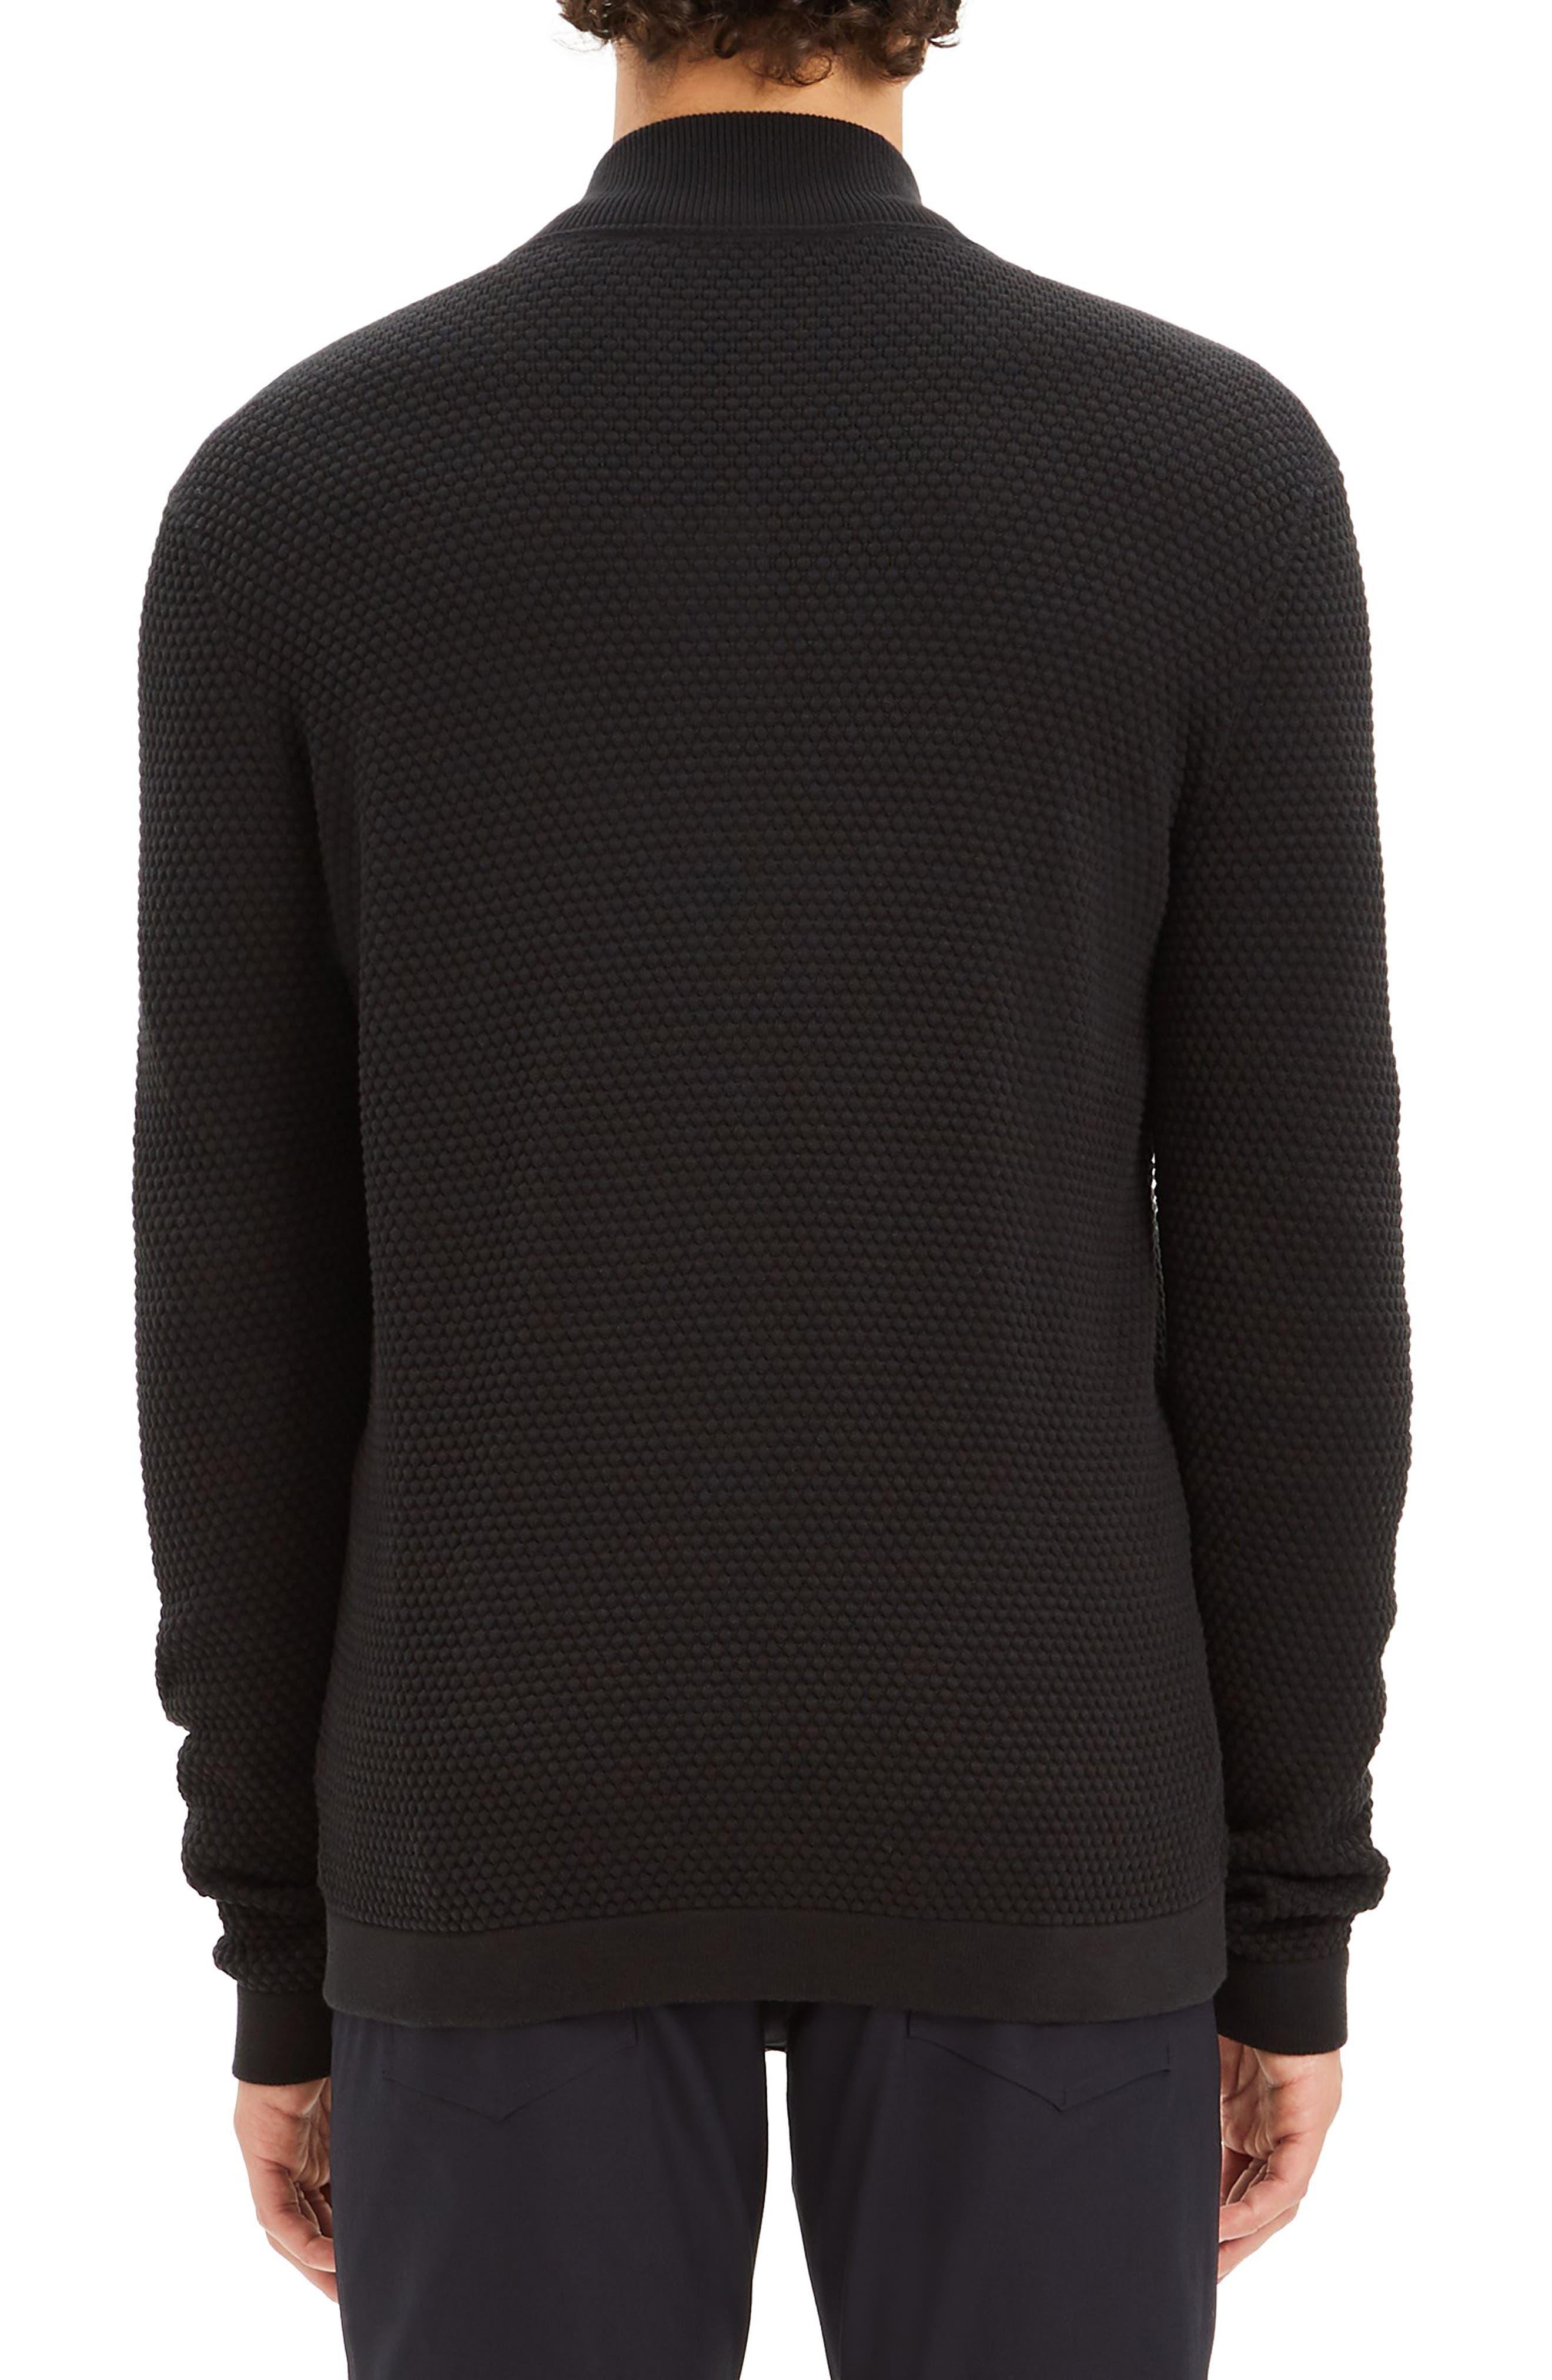 Udeval Breach Regular Fit Zip Sweater,                             Alternate thumbnail 2, color,                             BLACK